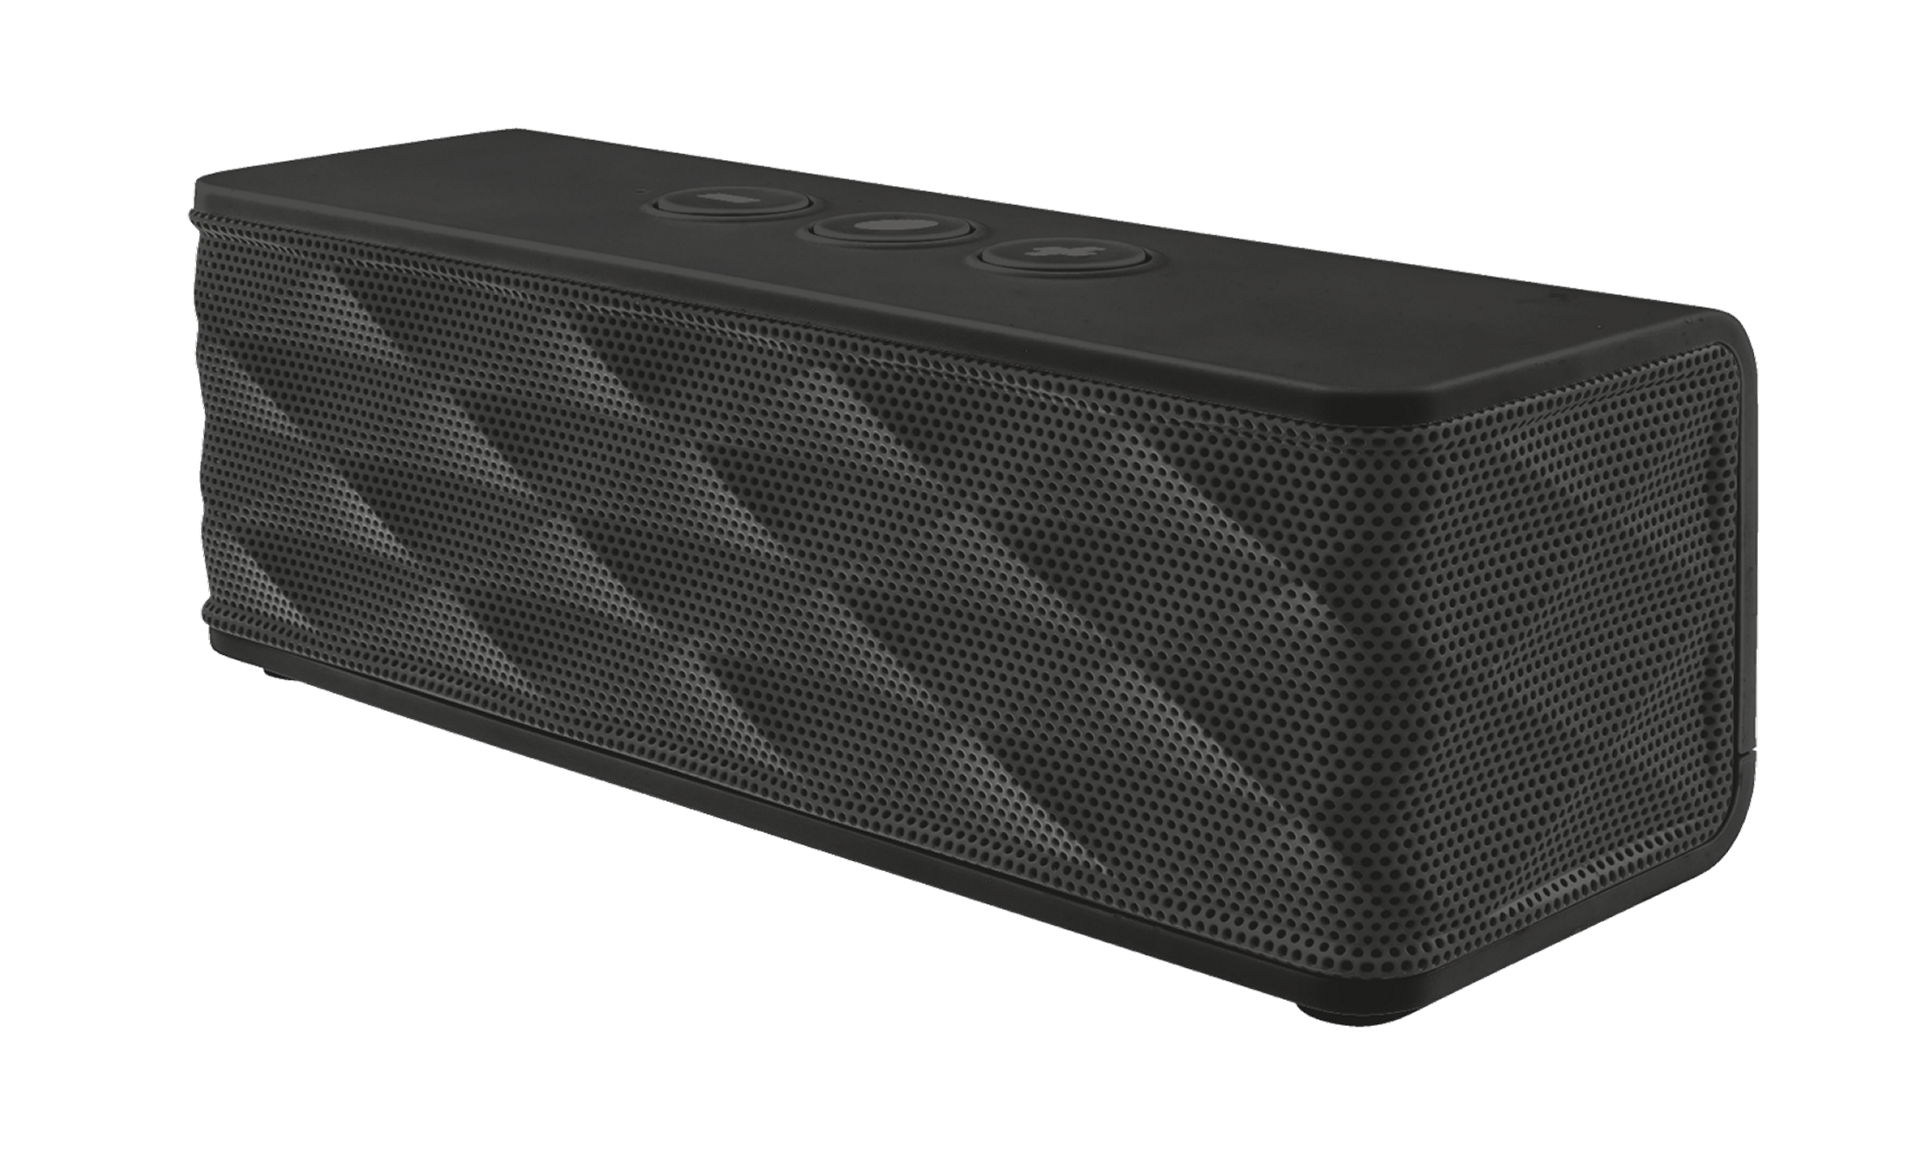 Bezdrátový reproduktor TRUST Jukebar Wireless Speaker černý